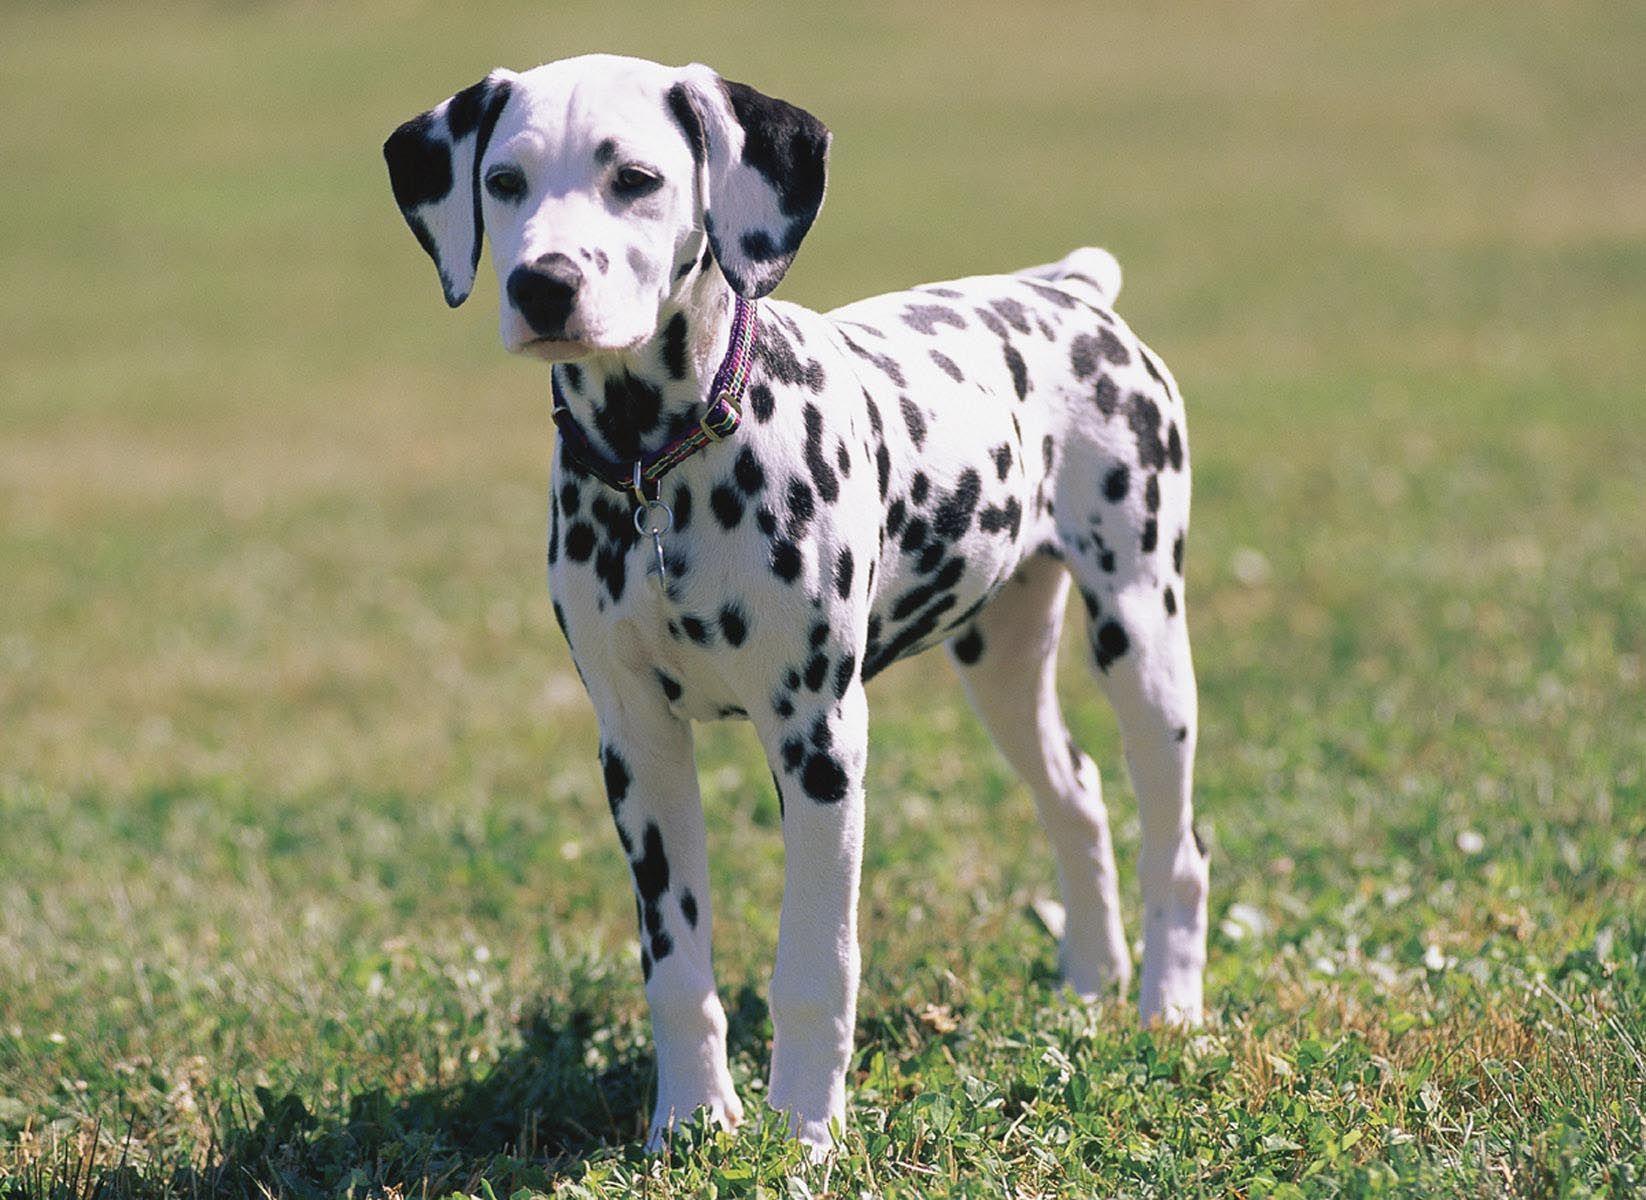 Dachshund Dalmatian Mix Breeders Dog Breed Information Dalmatian Breed Dalmatian Puppy Dalmatian Mix